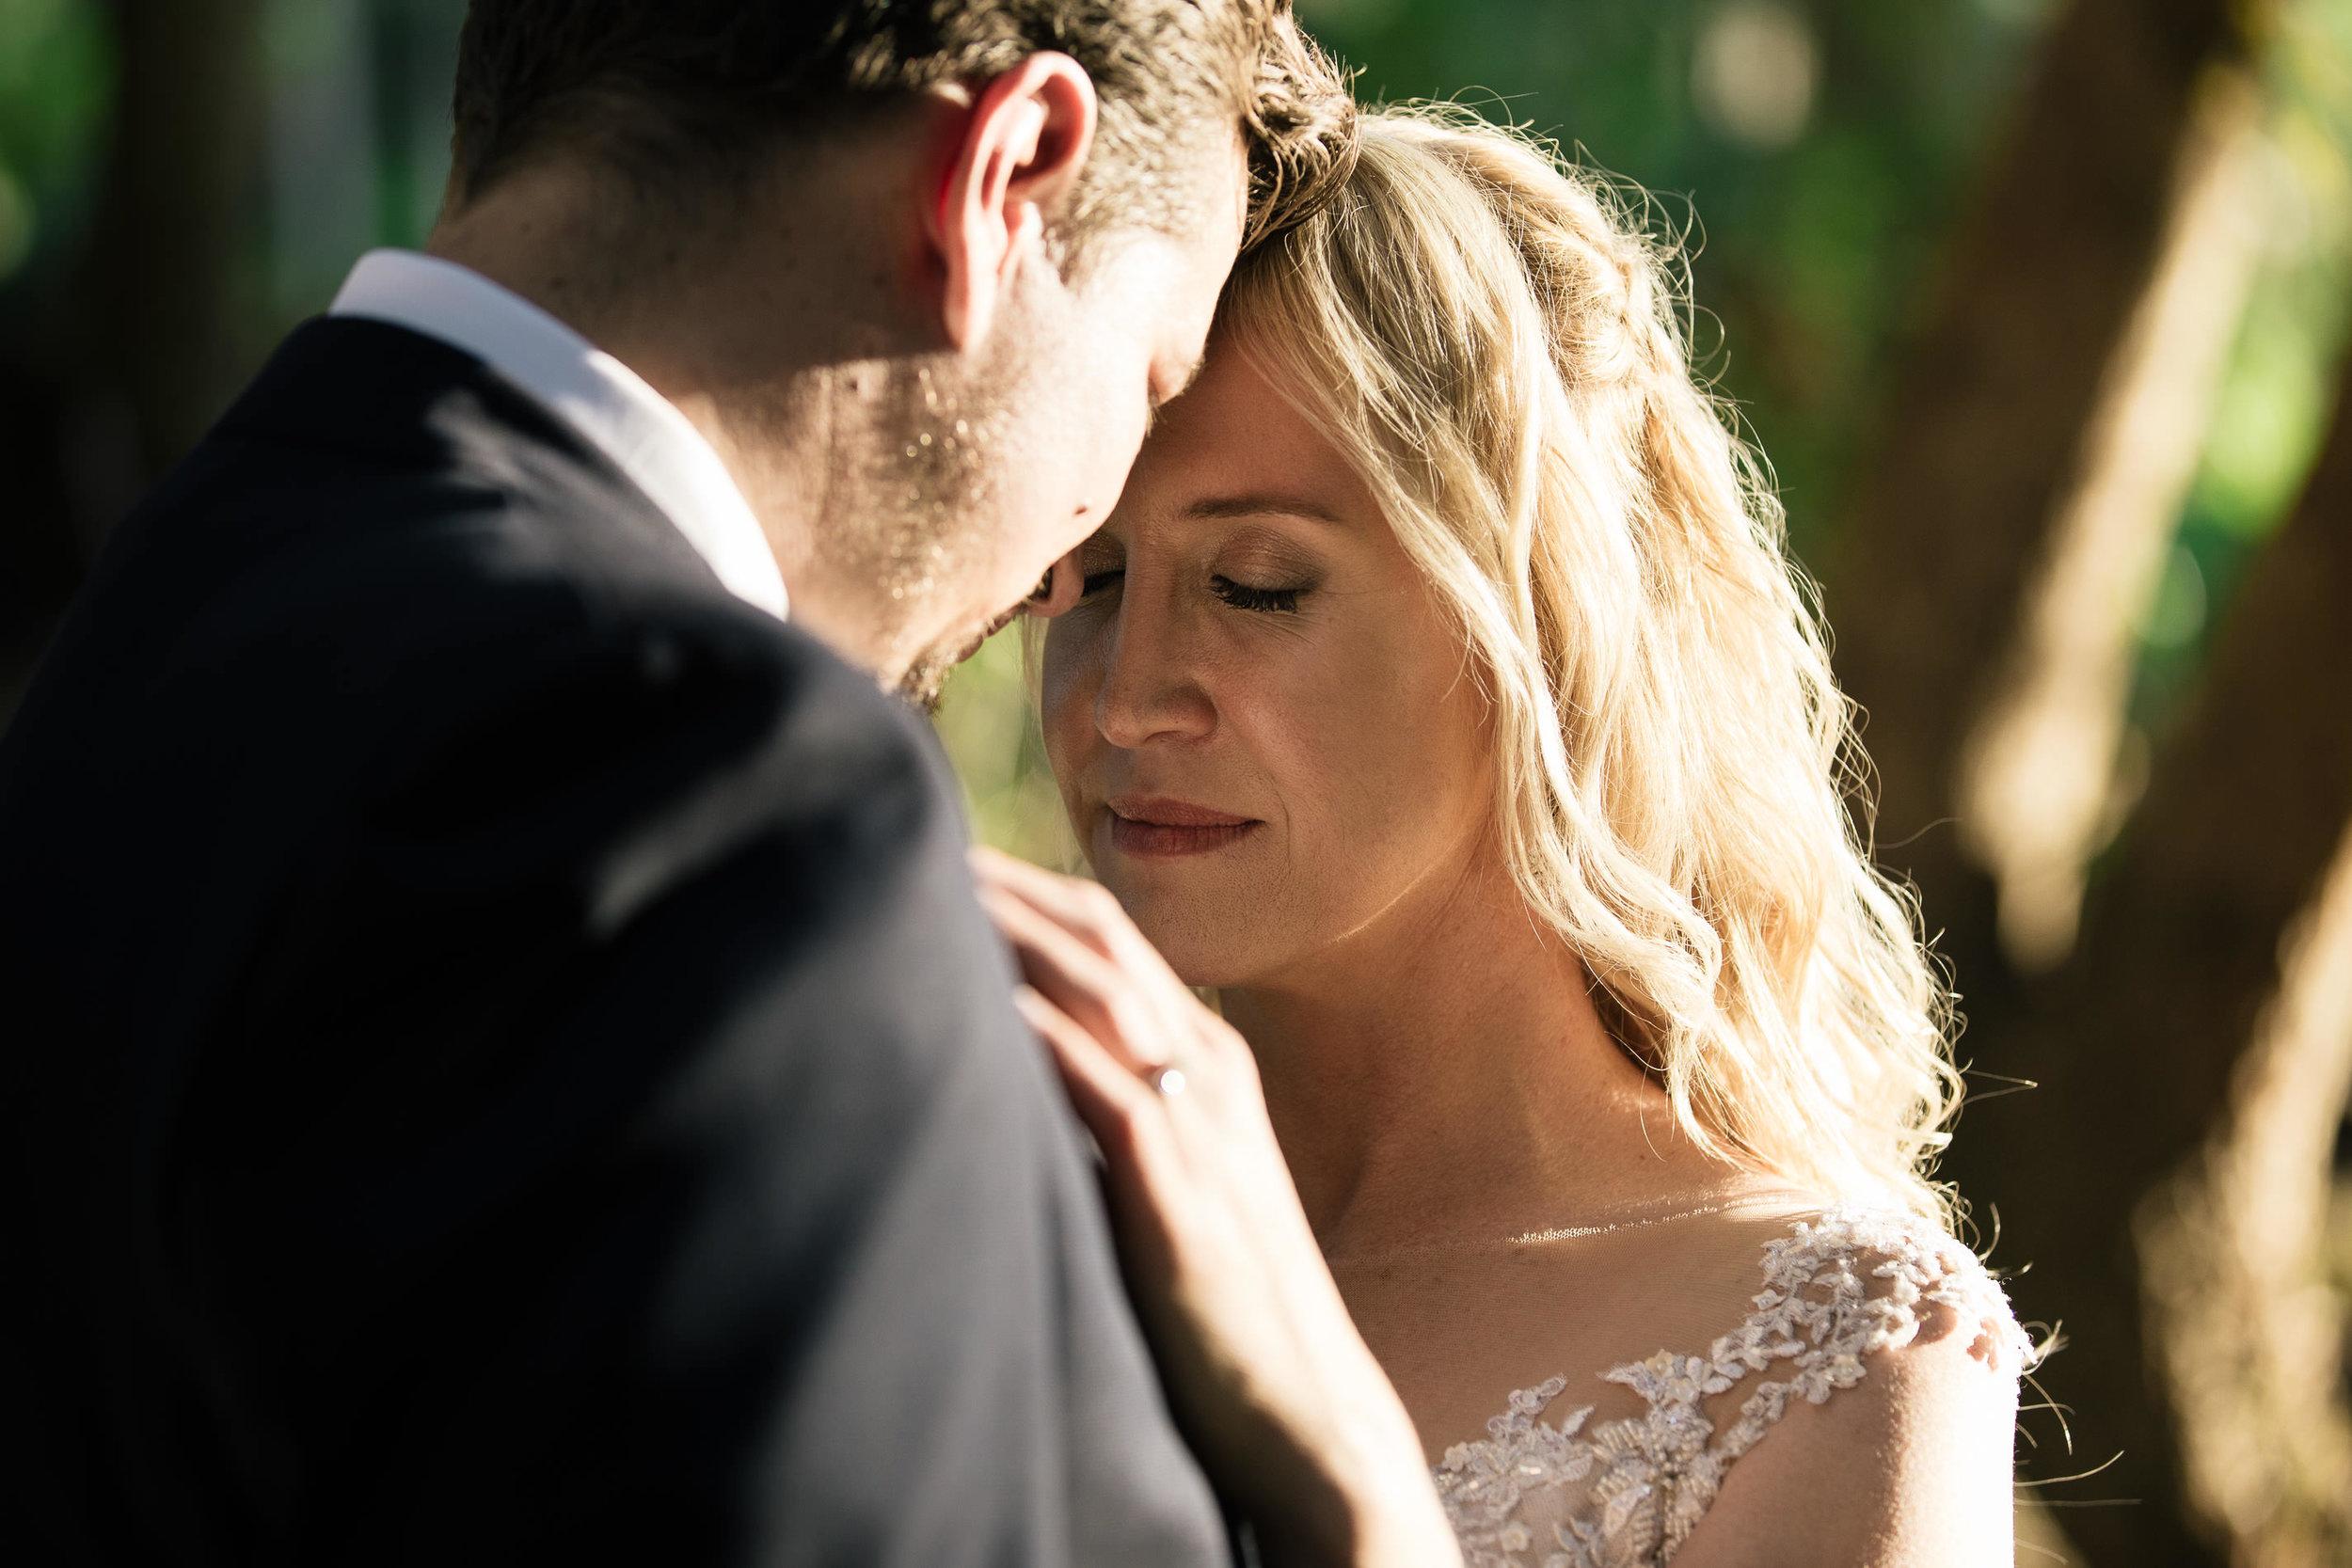 True North Photography_Boomerang Farm_Stacey and Isaac_Gold Coast Wedding_Barm Wedding_Hinterland Wedding-134.jpg